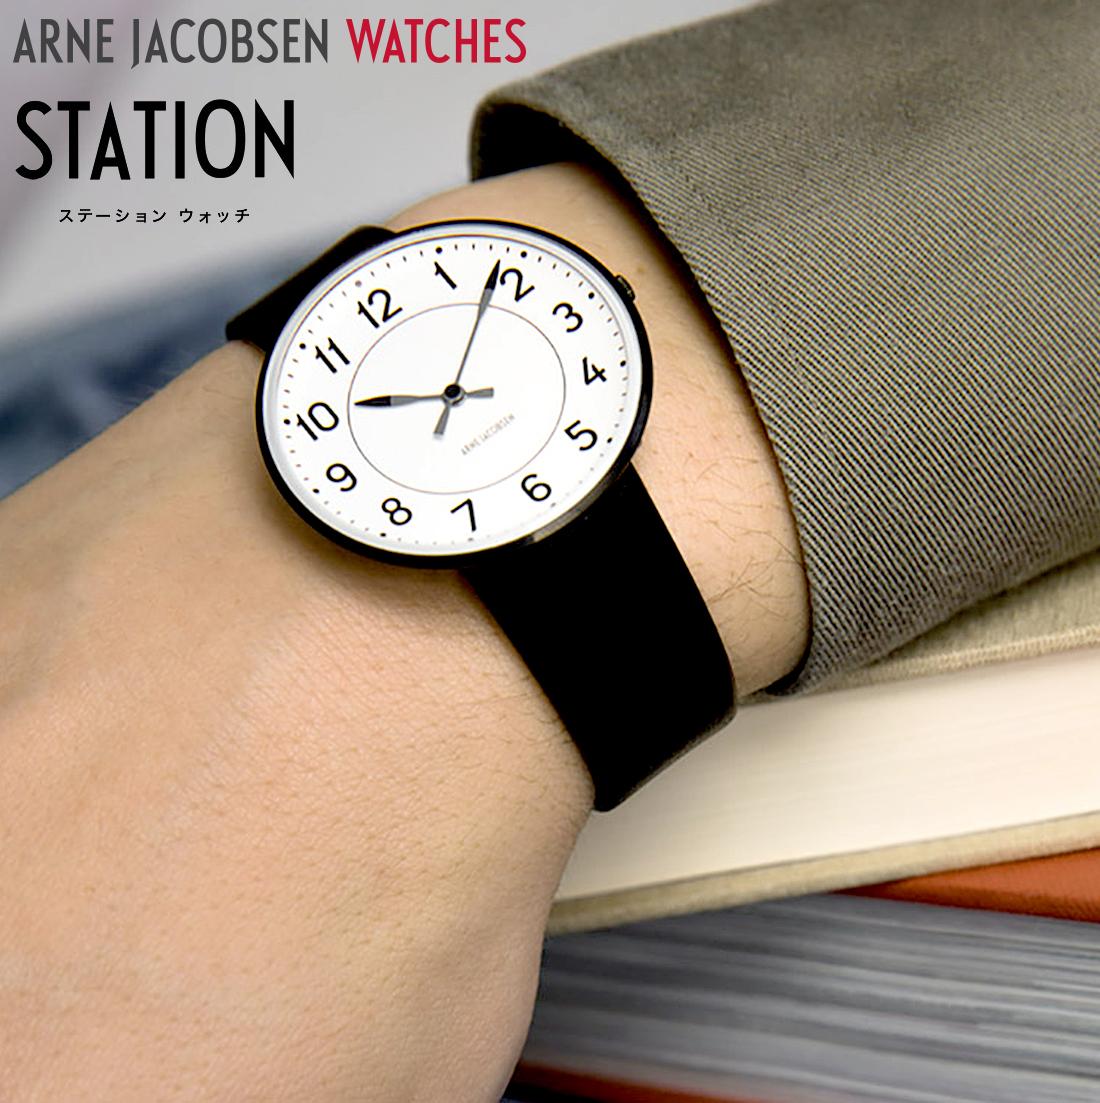 ARNE JACOBSEN WATCH STATION BLACK アルネヤコブセン ステーション ブラック腕時計 時計 ウォッチ WATCH 北欧 デンマーク ローゼンダール コンビニ受取対応